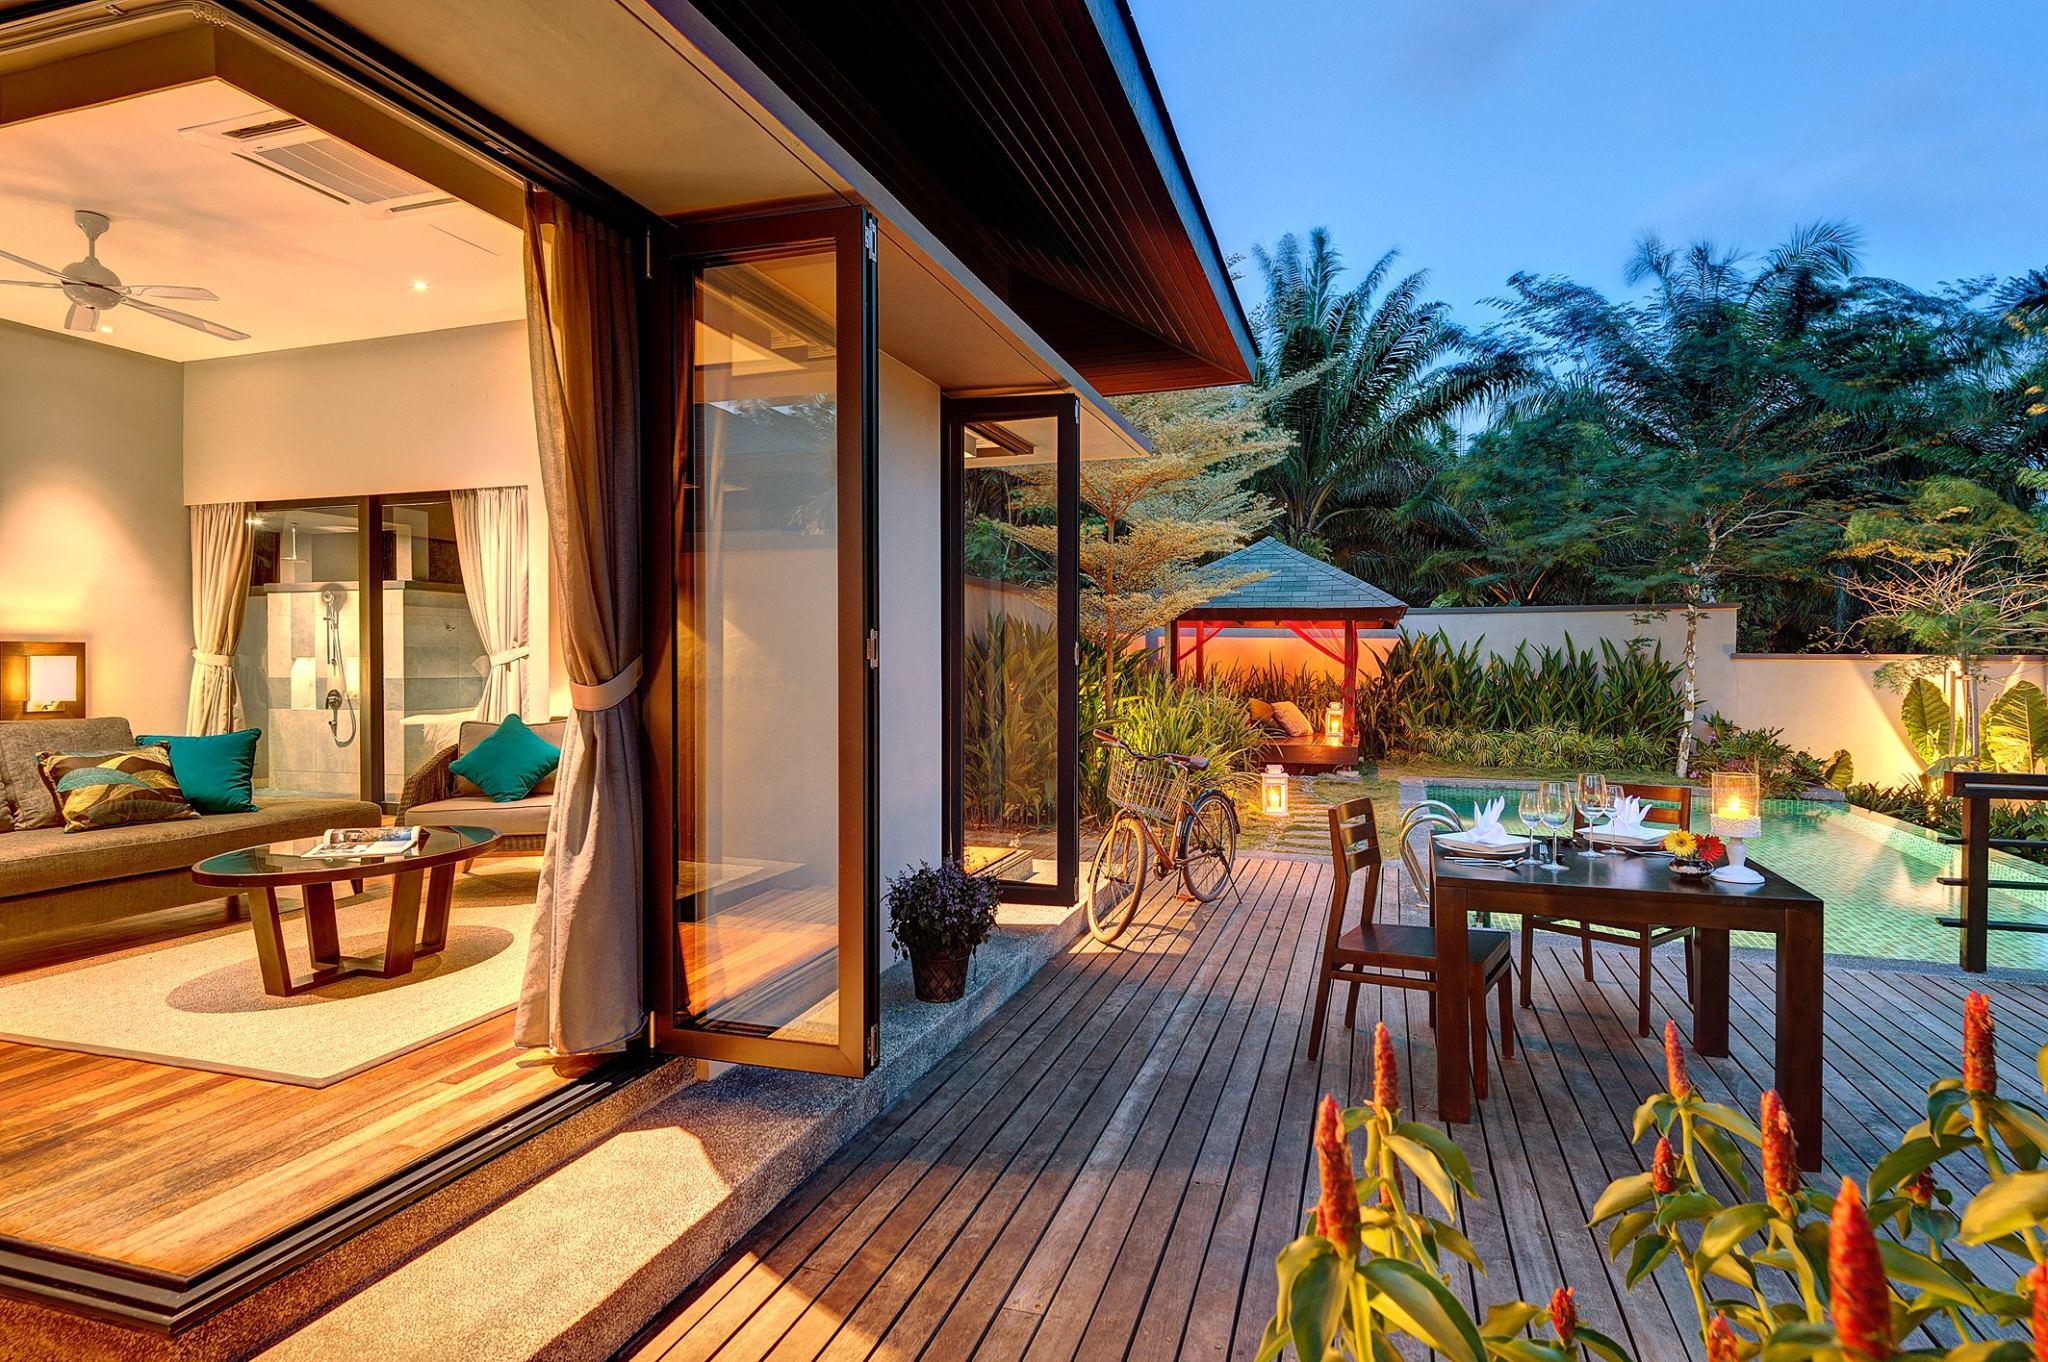 Image from Mangala Resort & Spa